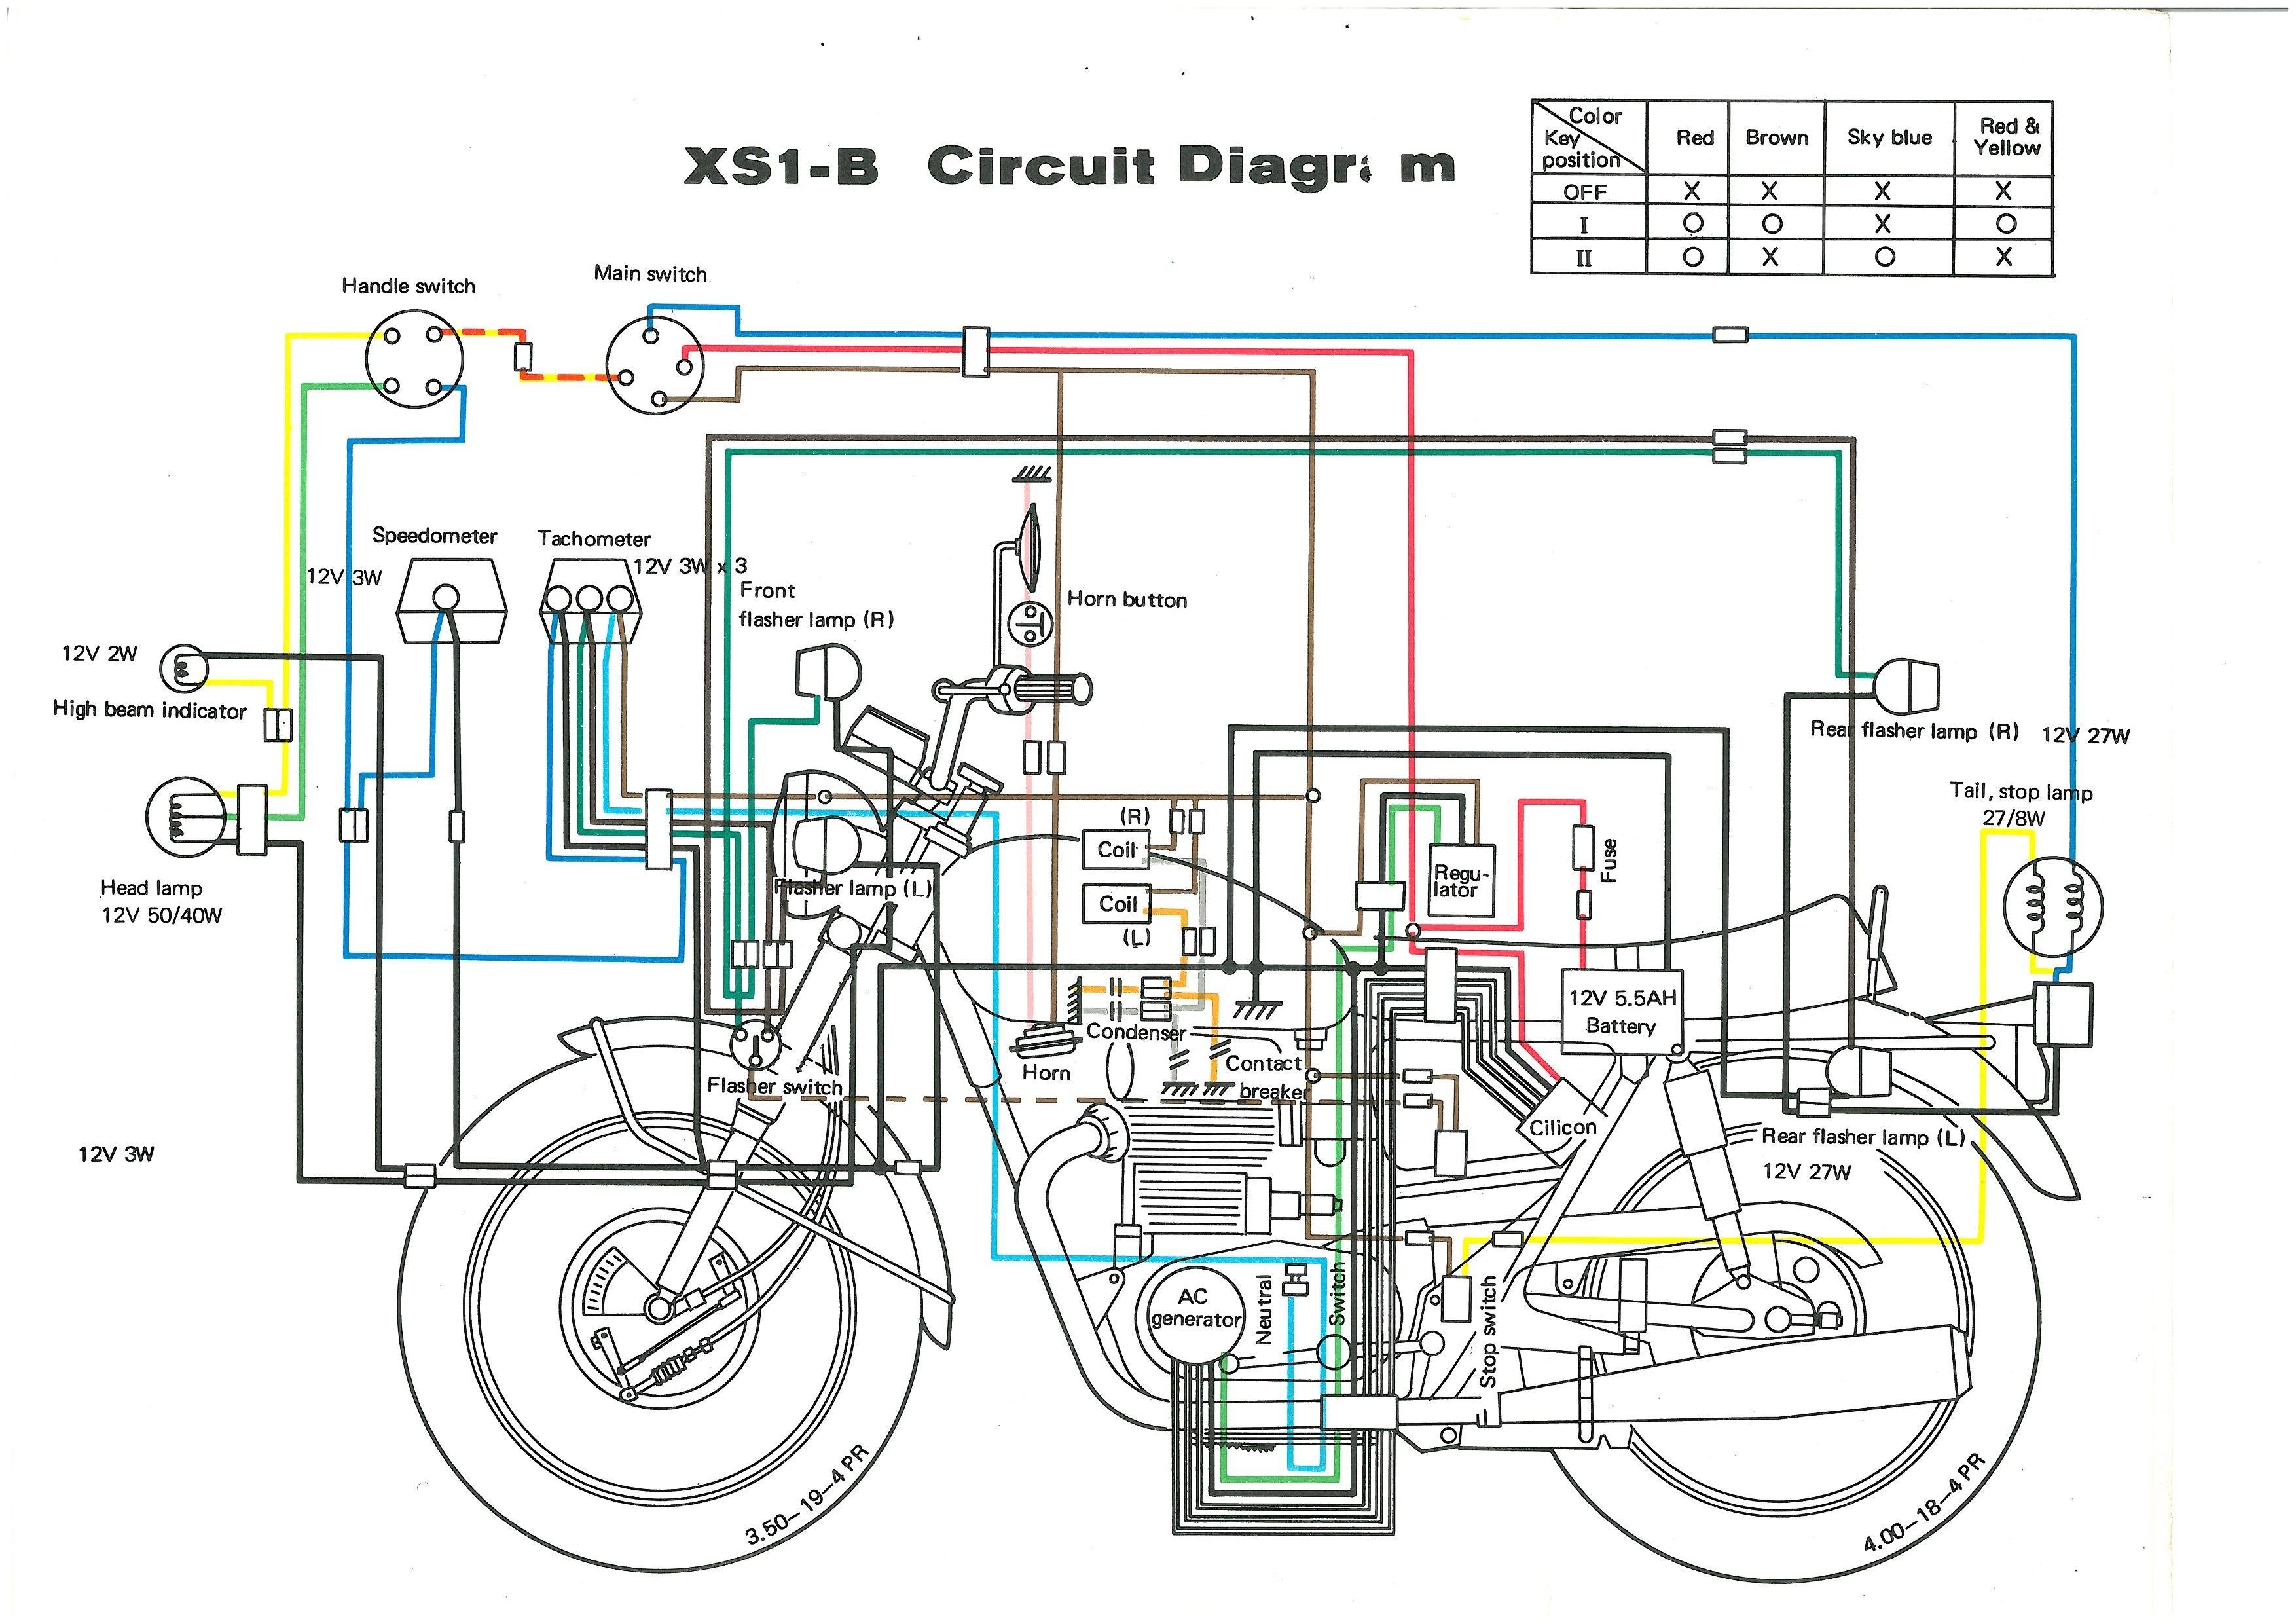 1982 yamaha maxim 750 wiring diagram 14 8 tridonicsignage de \u20221983 yamaha  maxim wiring diagrams